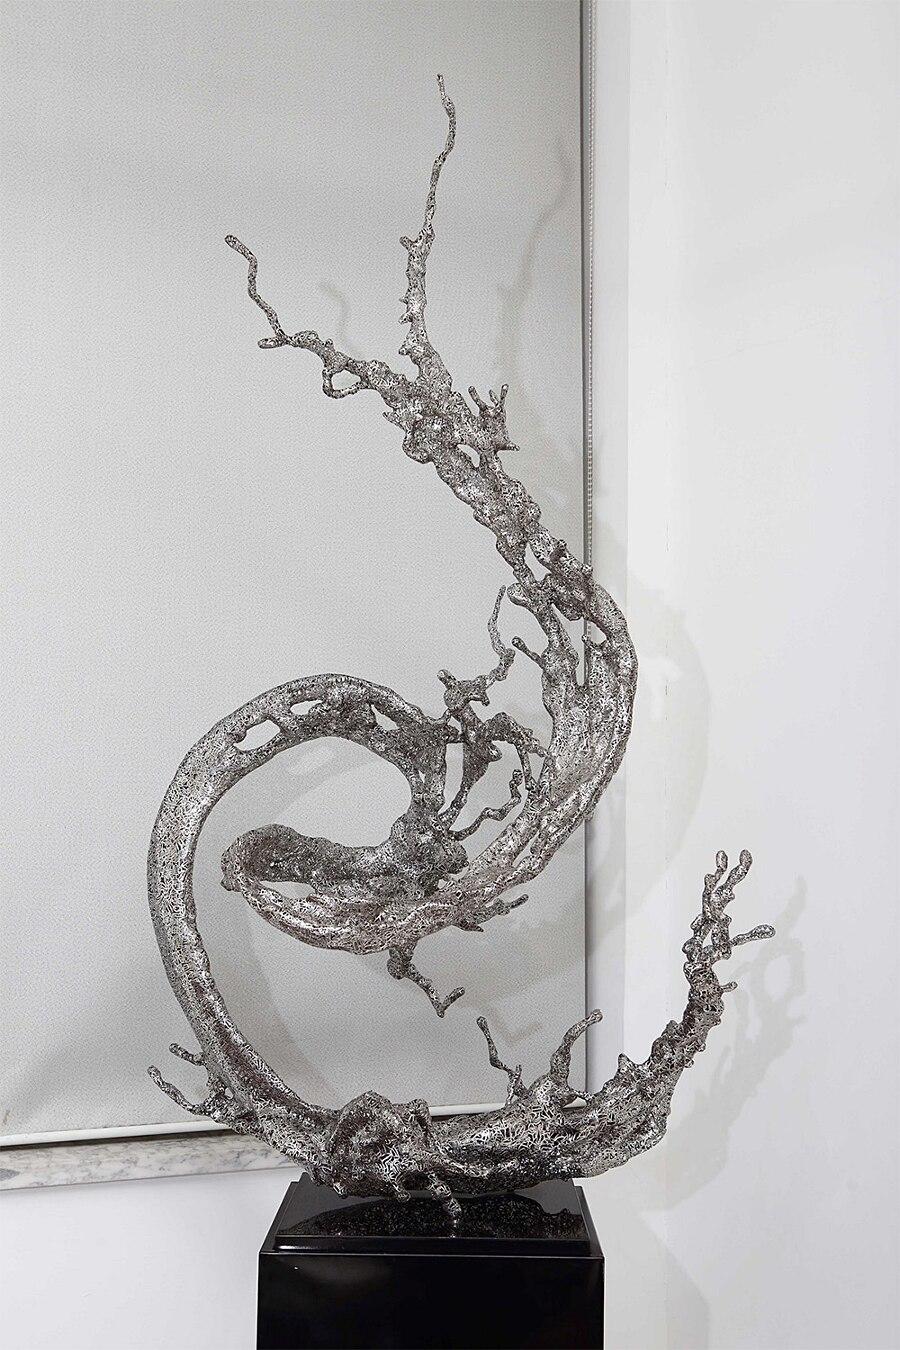 sculture-calligrafia-acciaio-zheng-lu-3